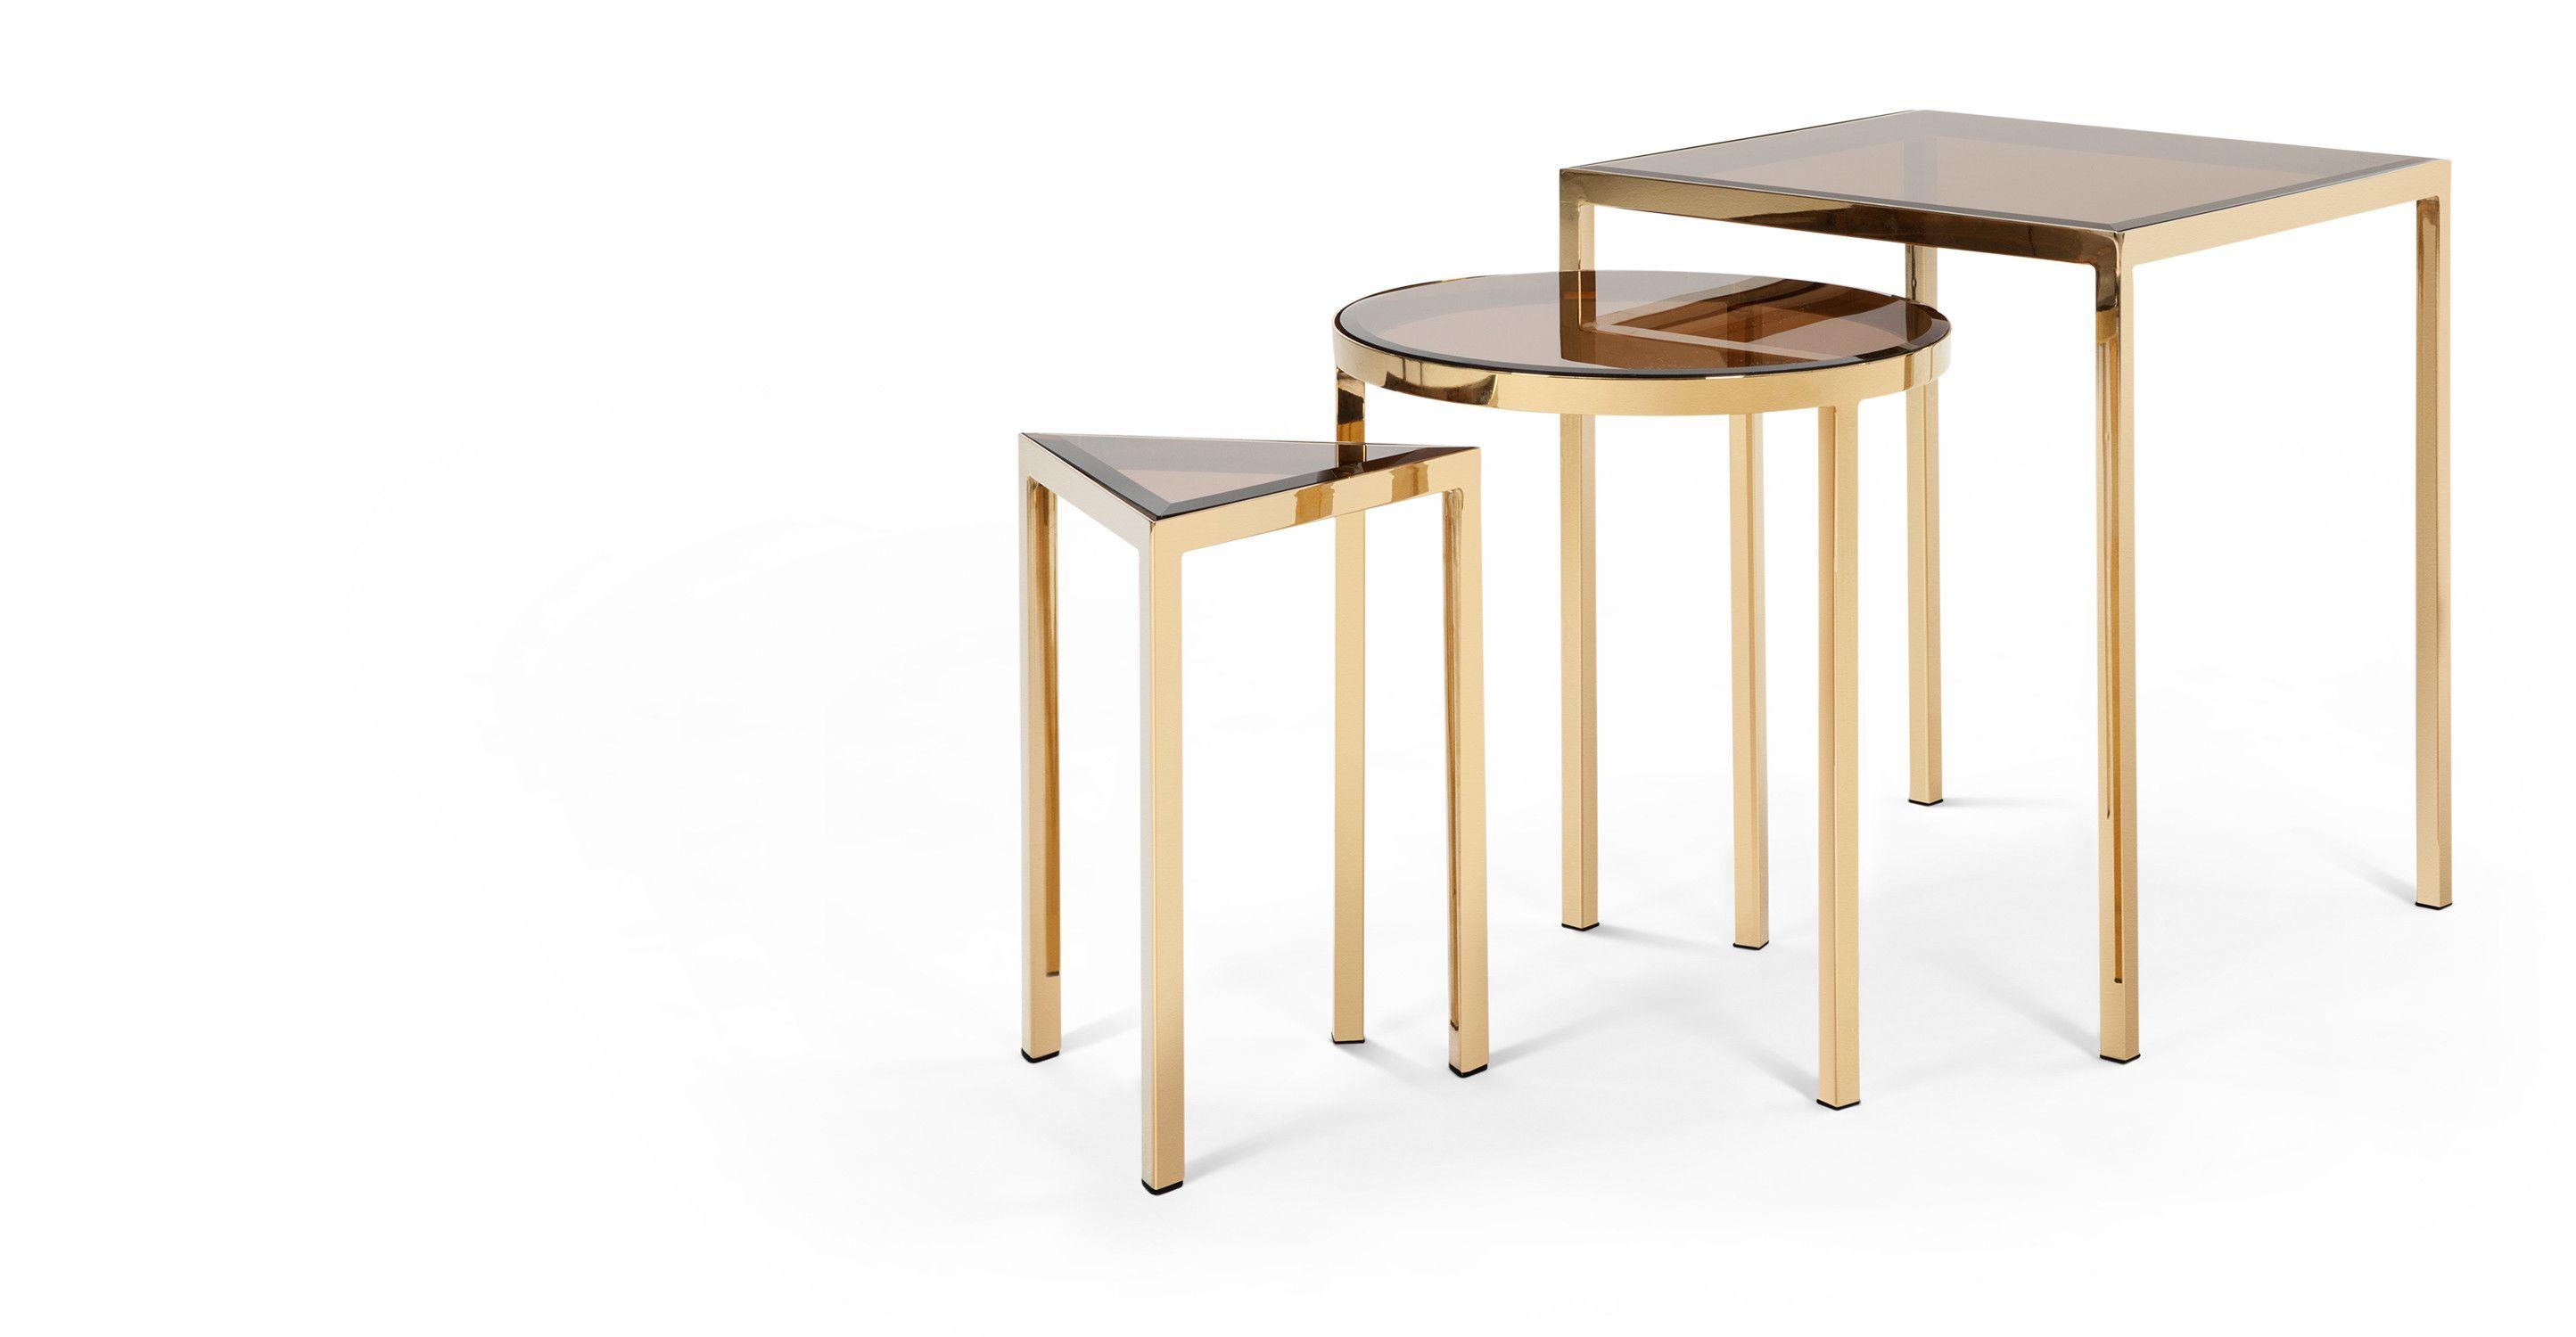 2b2241d9dc7e0f1f405310869da84f02 Frais De La Redoute Table Haute Concept